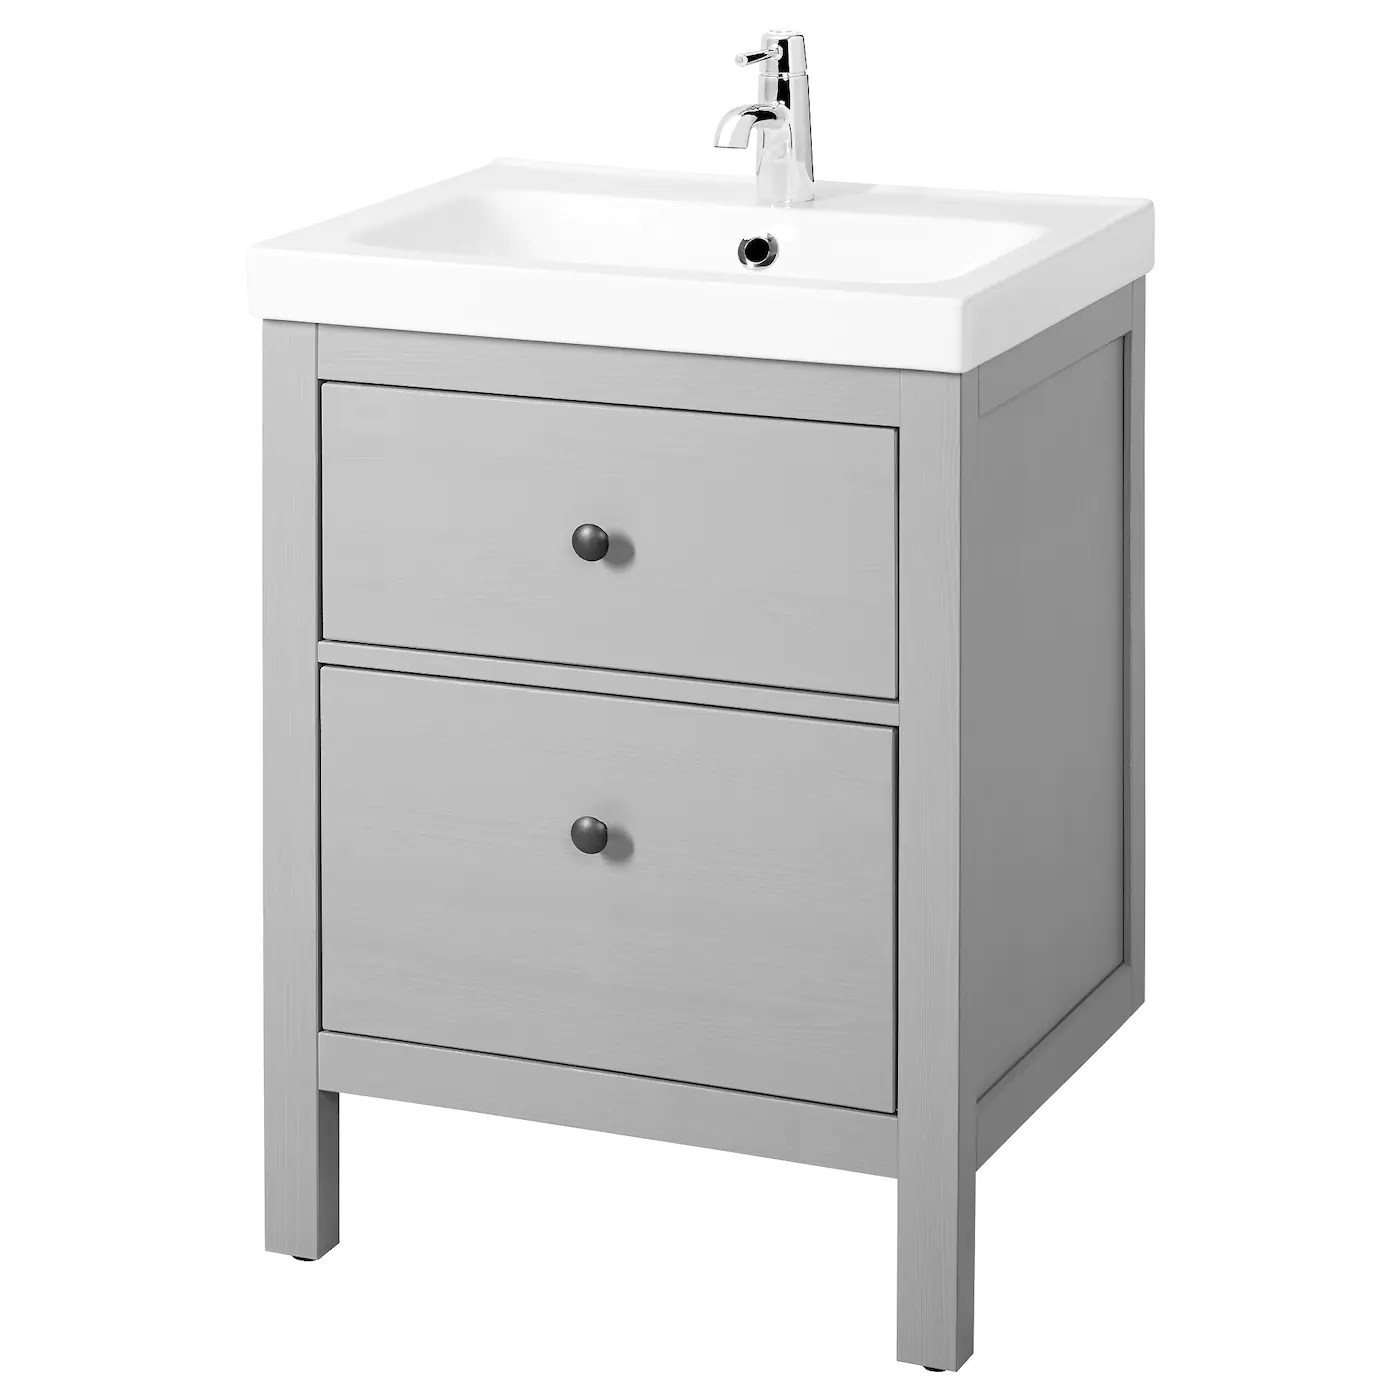 hemnes odensvik bathroom vanity gray 24 3 4x19 1 4x35 63x49x89 cm